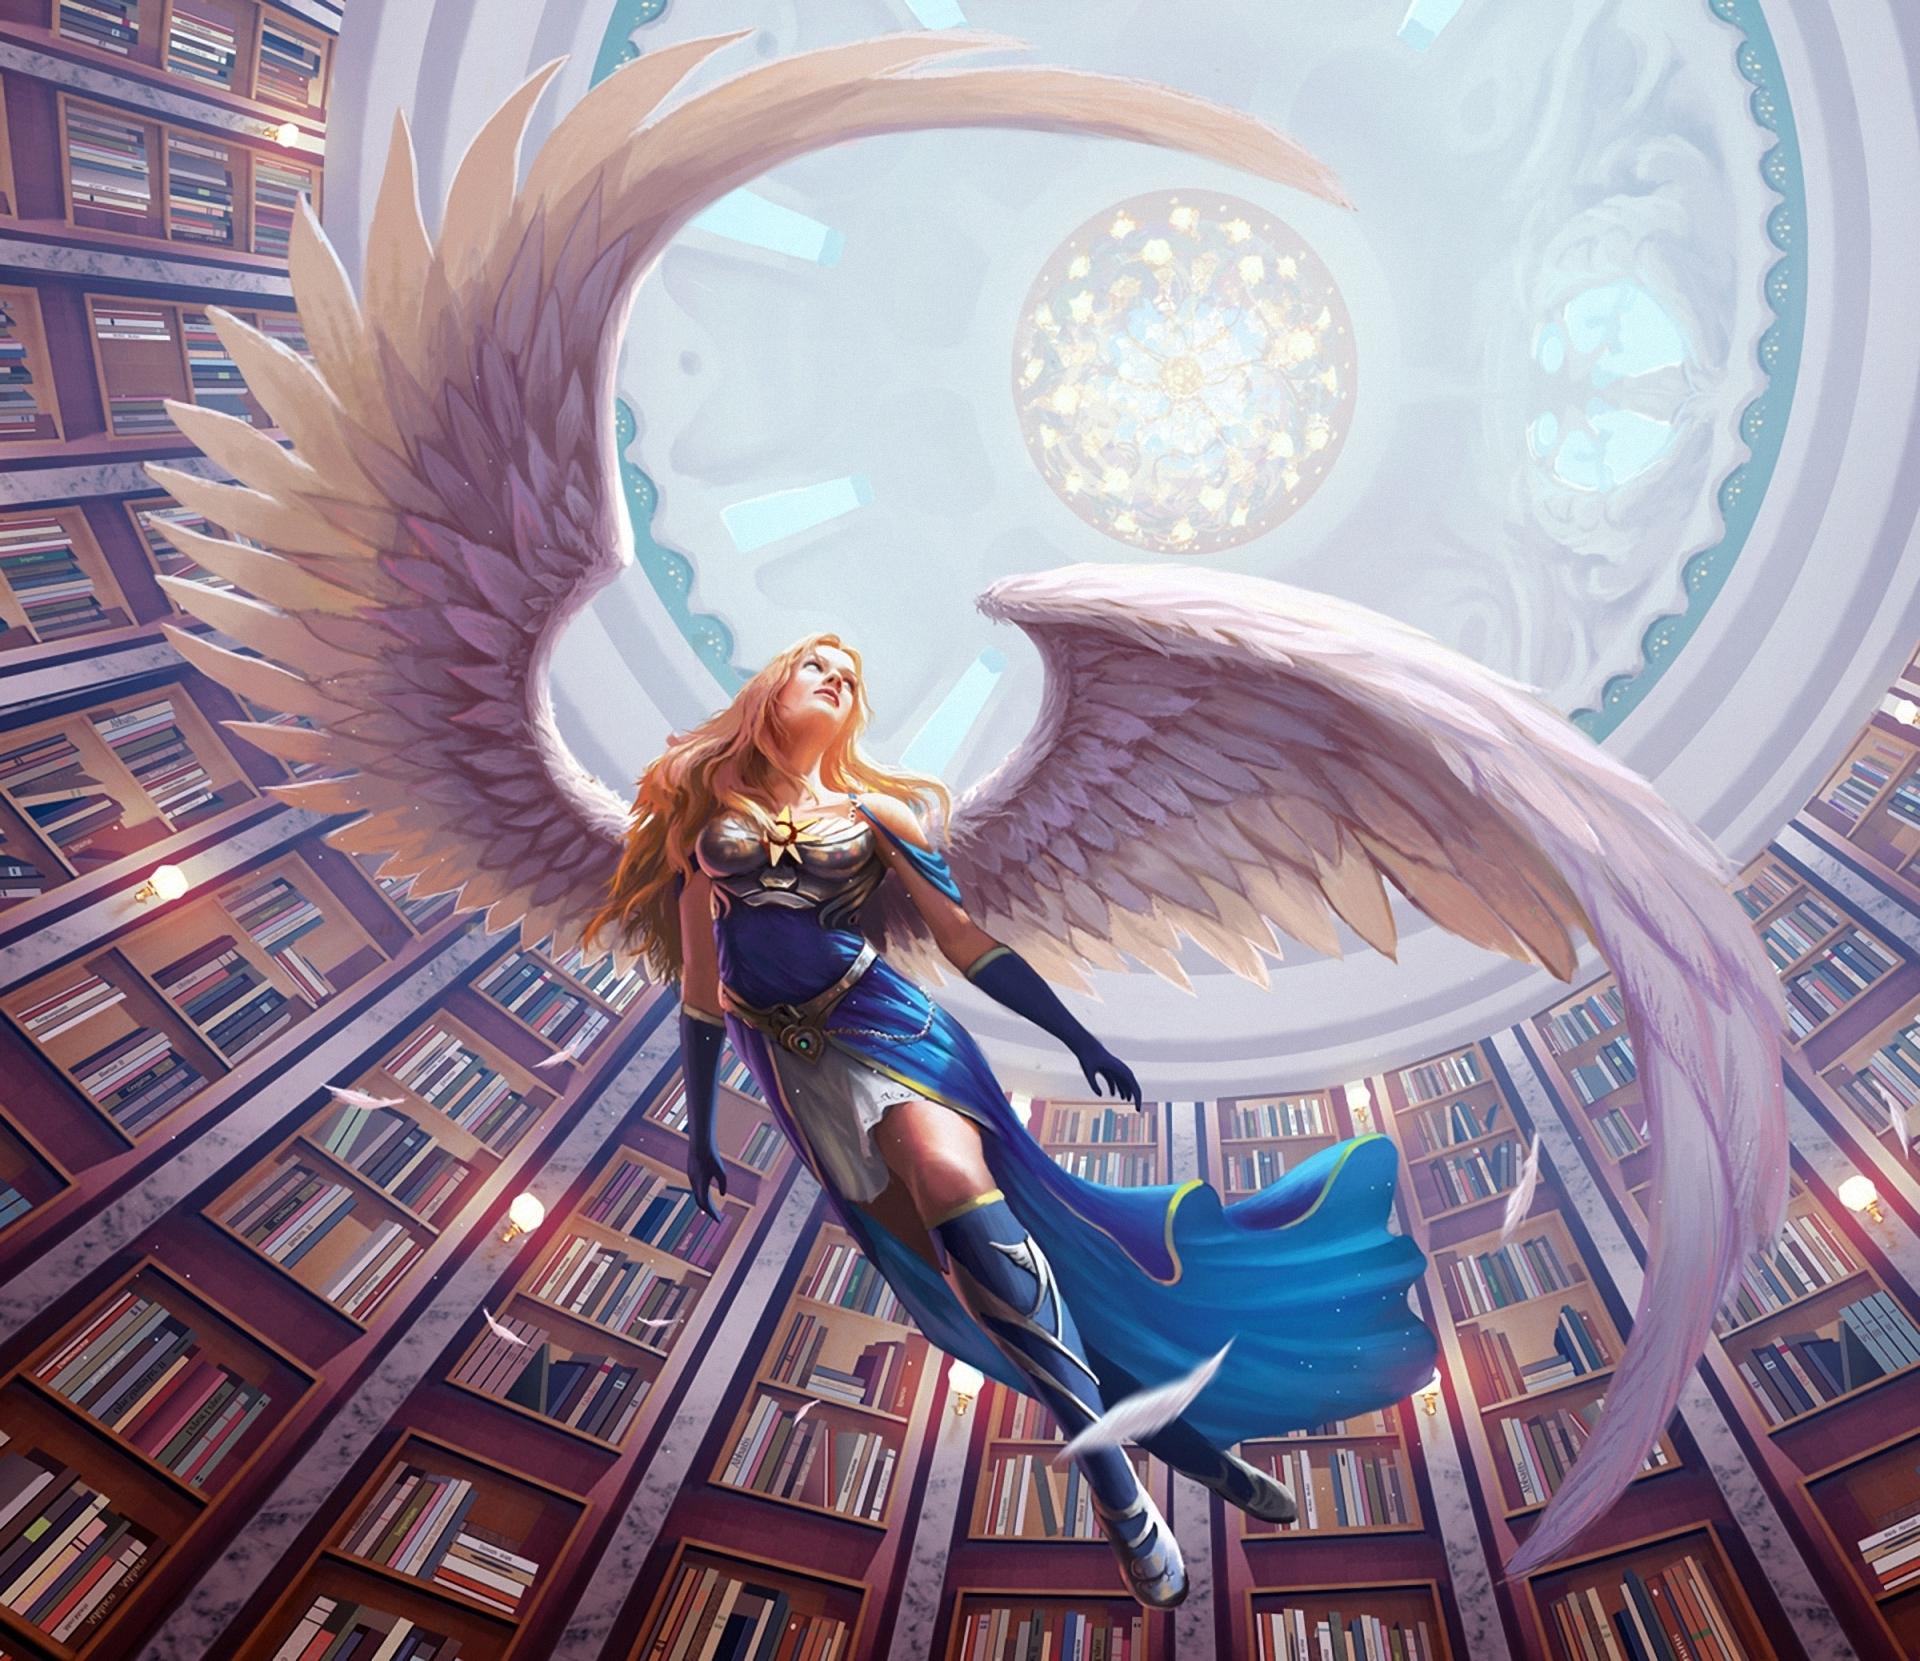 Angels wings flight fantasy girls angel wallpaper - Angel girl wallpaper ...